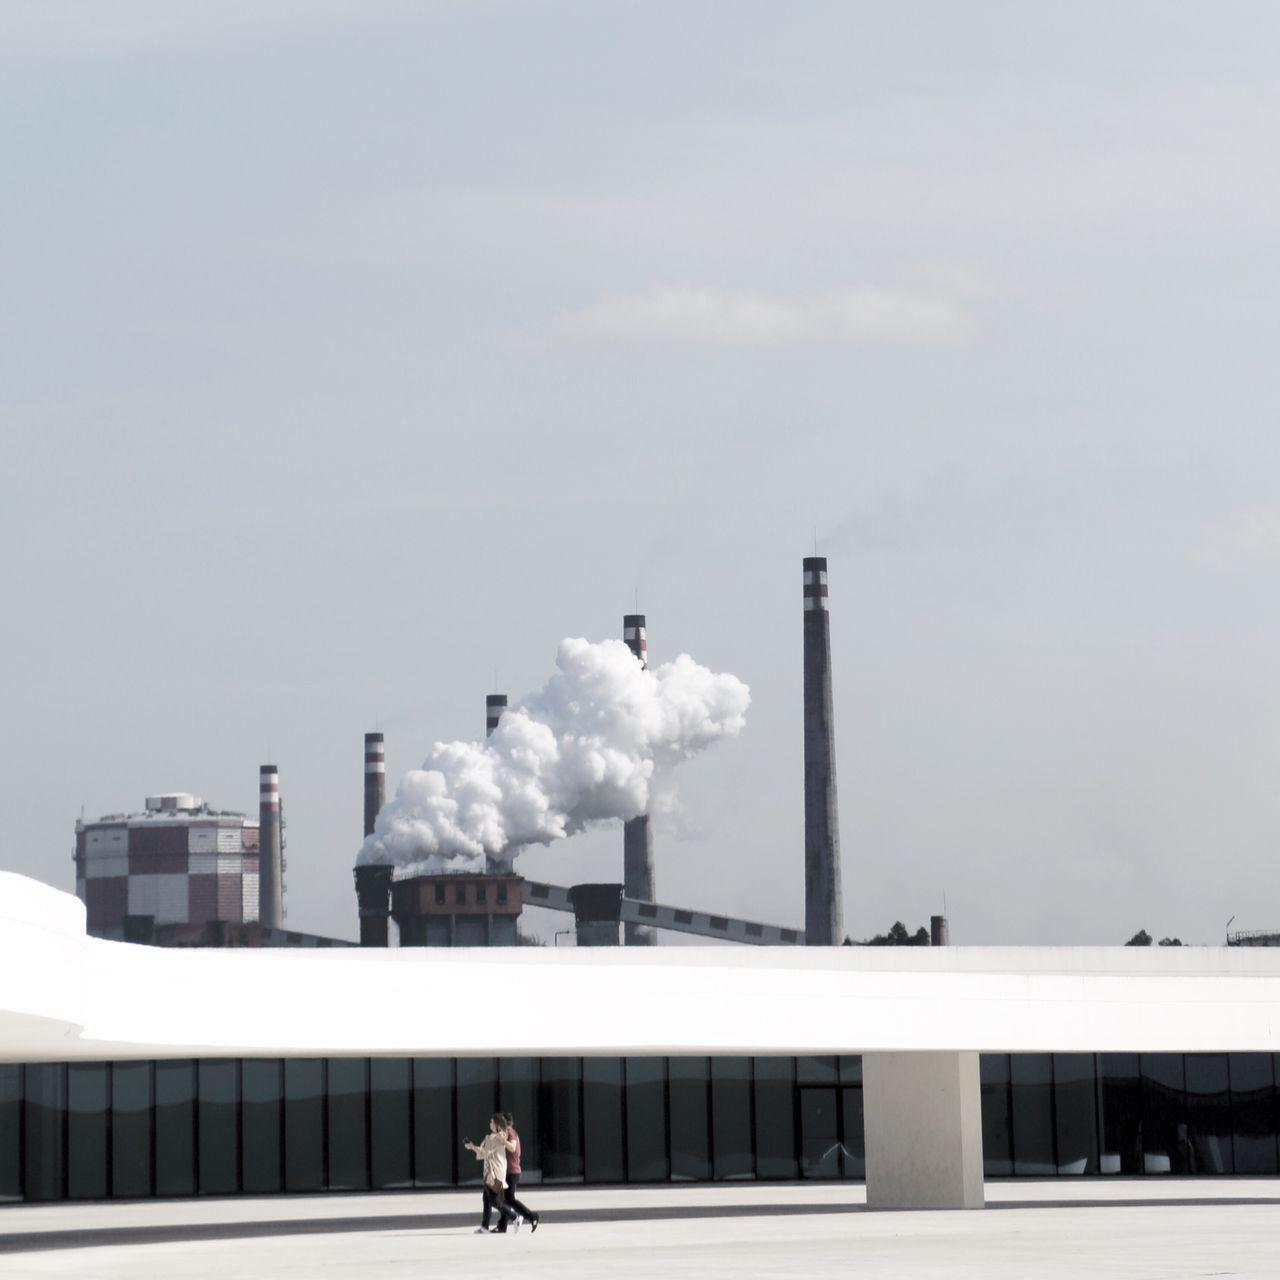 Arquitecture Factory Industry Minimalism Air Pollution Cloud - Sky Landscape Niemeyer